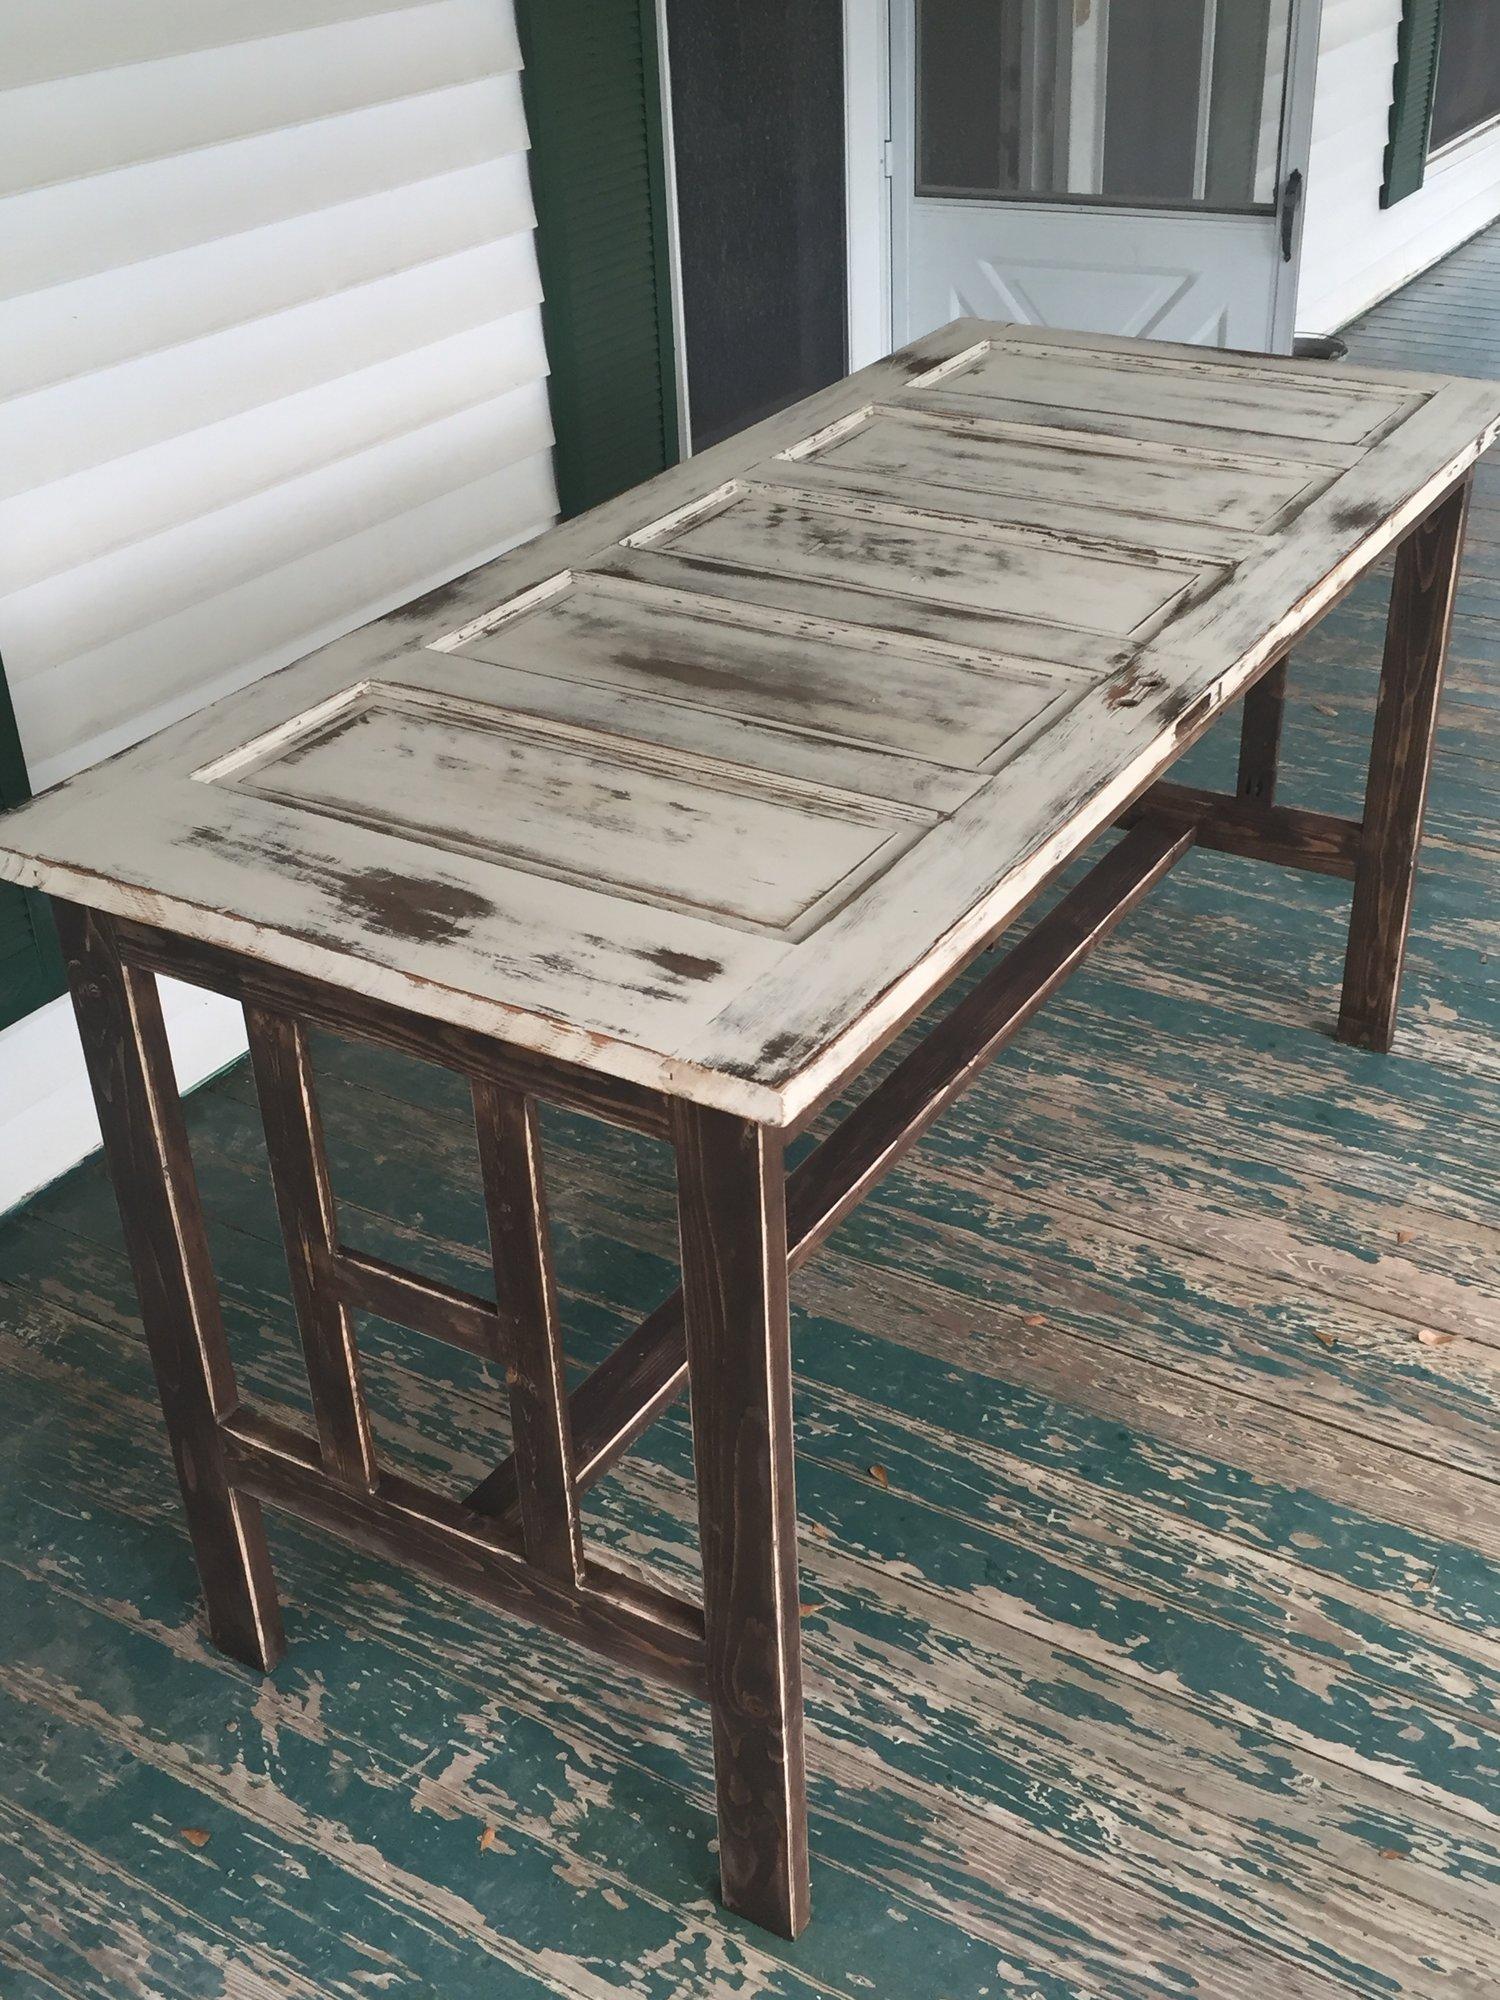 Antique Door Bar Table - Antique Door Bar Table — The Nomad CW